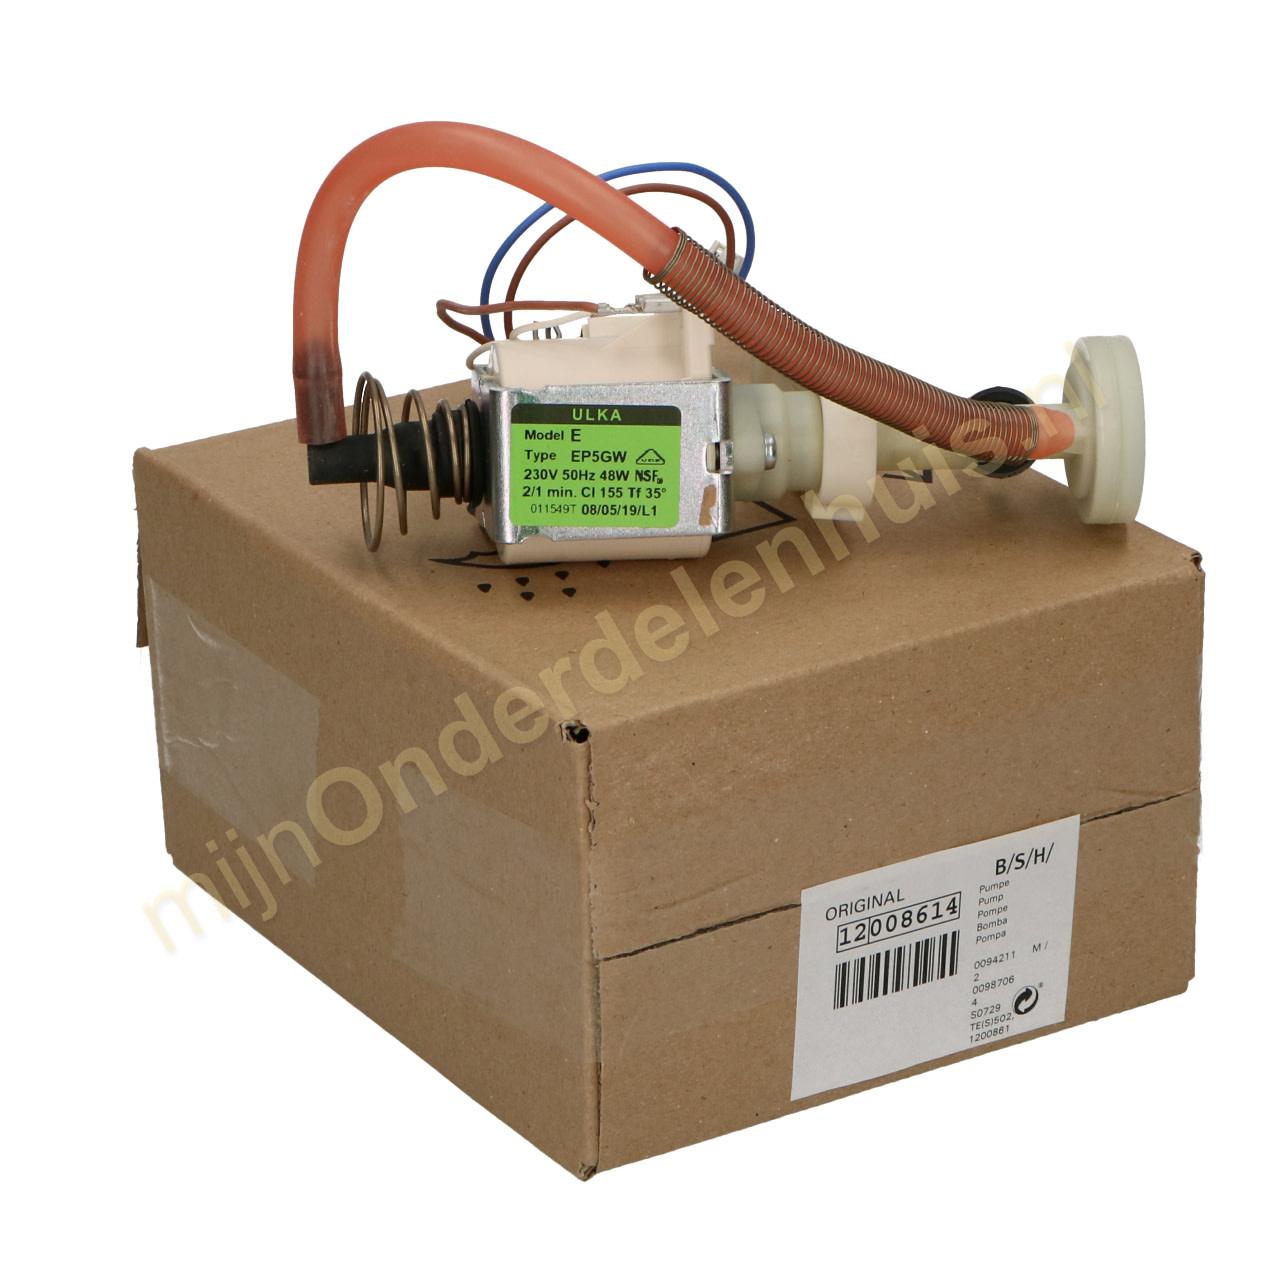 Siemens Neff POMPA ULKA ep5gw 230 Volt 12008614 Bosch OT